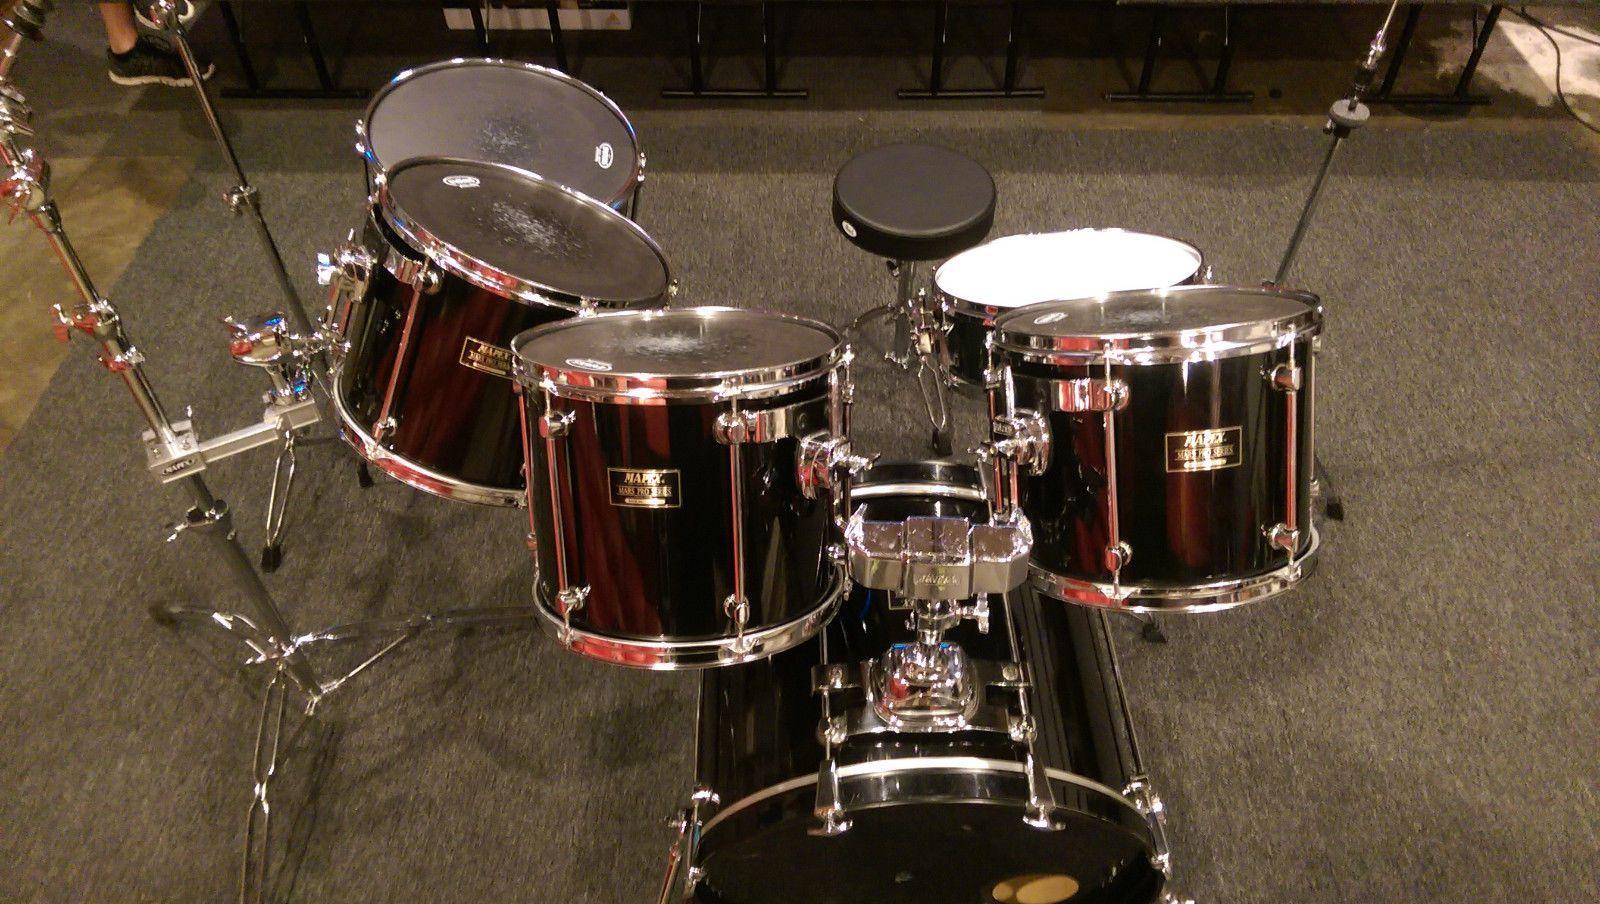 MAPEX MARS PRO SERIES DRUM SET 6 Piece Black Lacquer Drum Kit Including Two